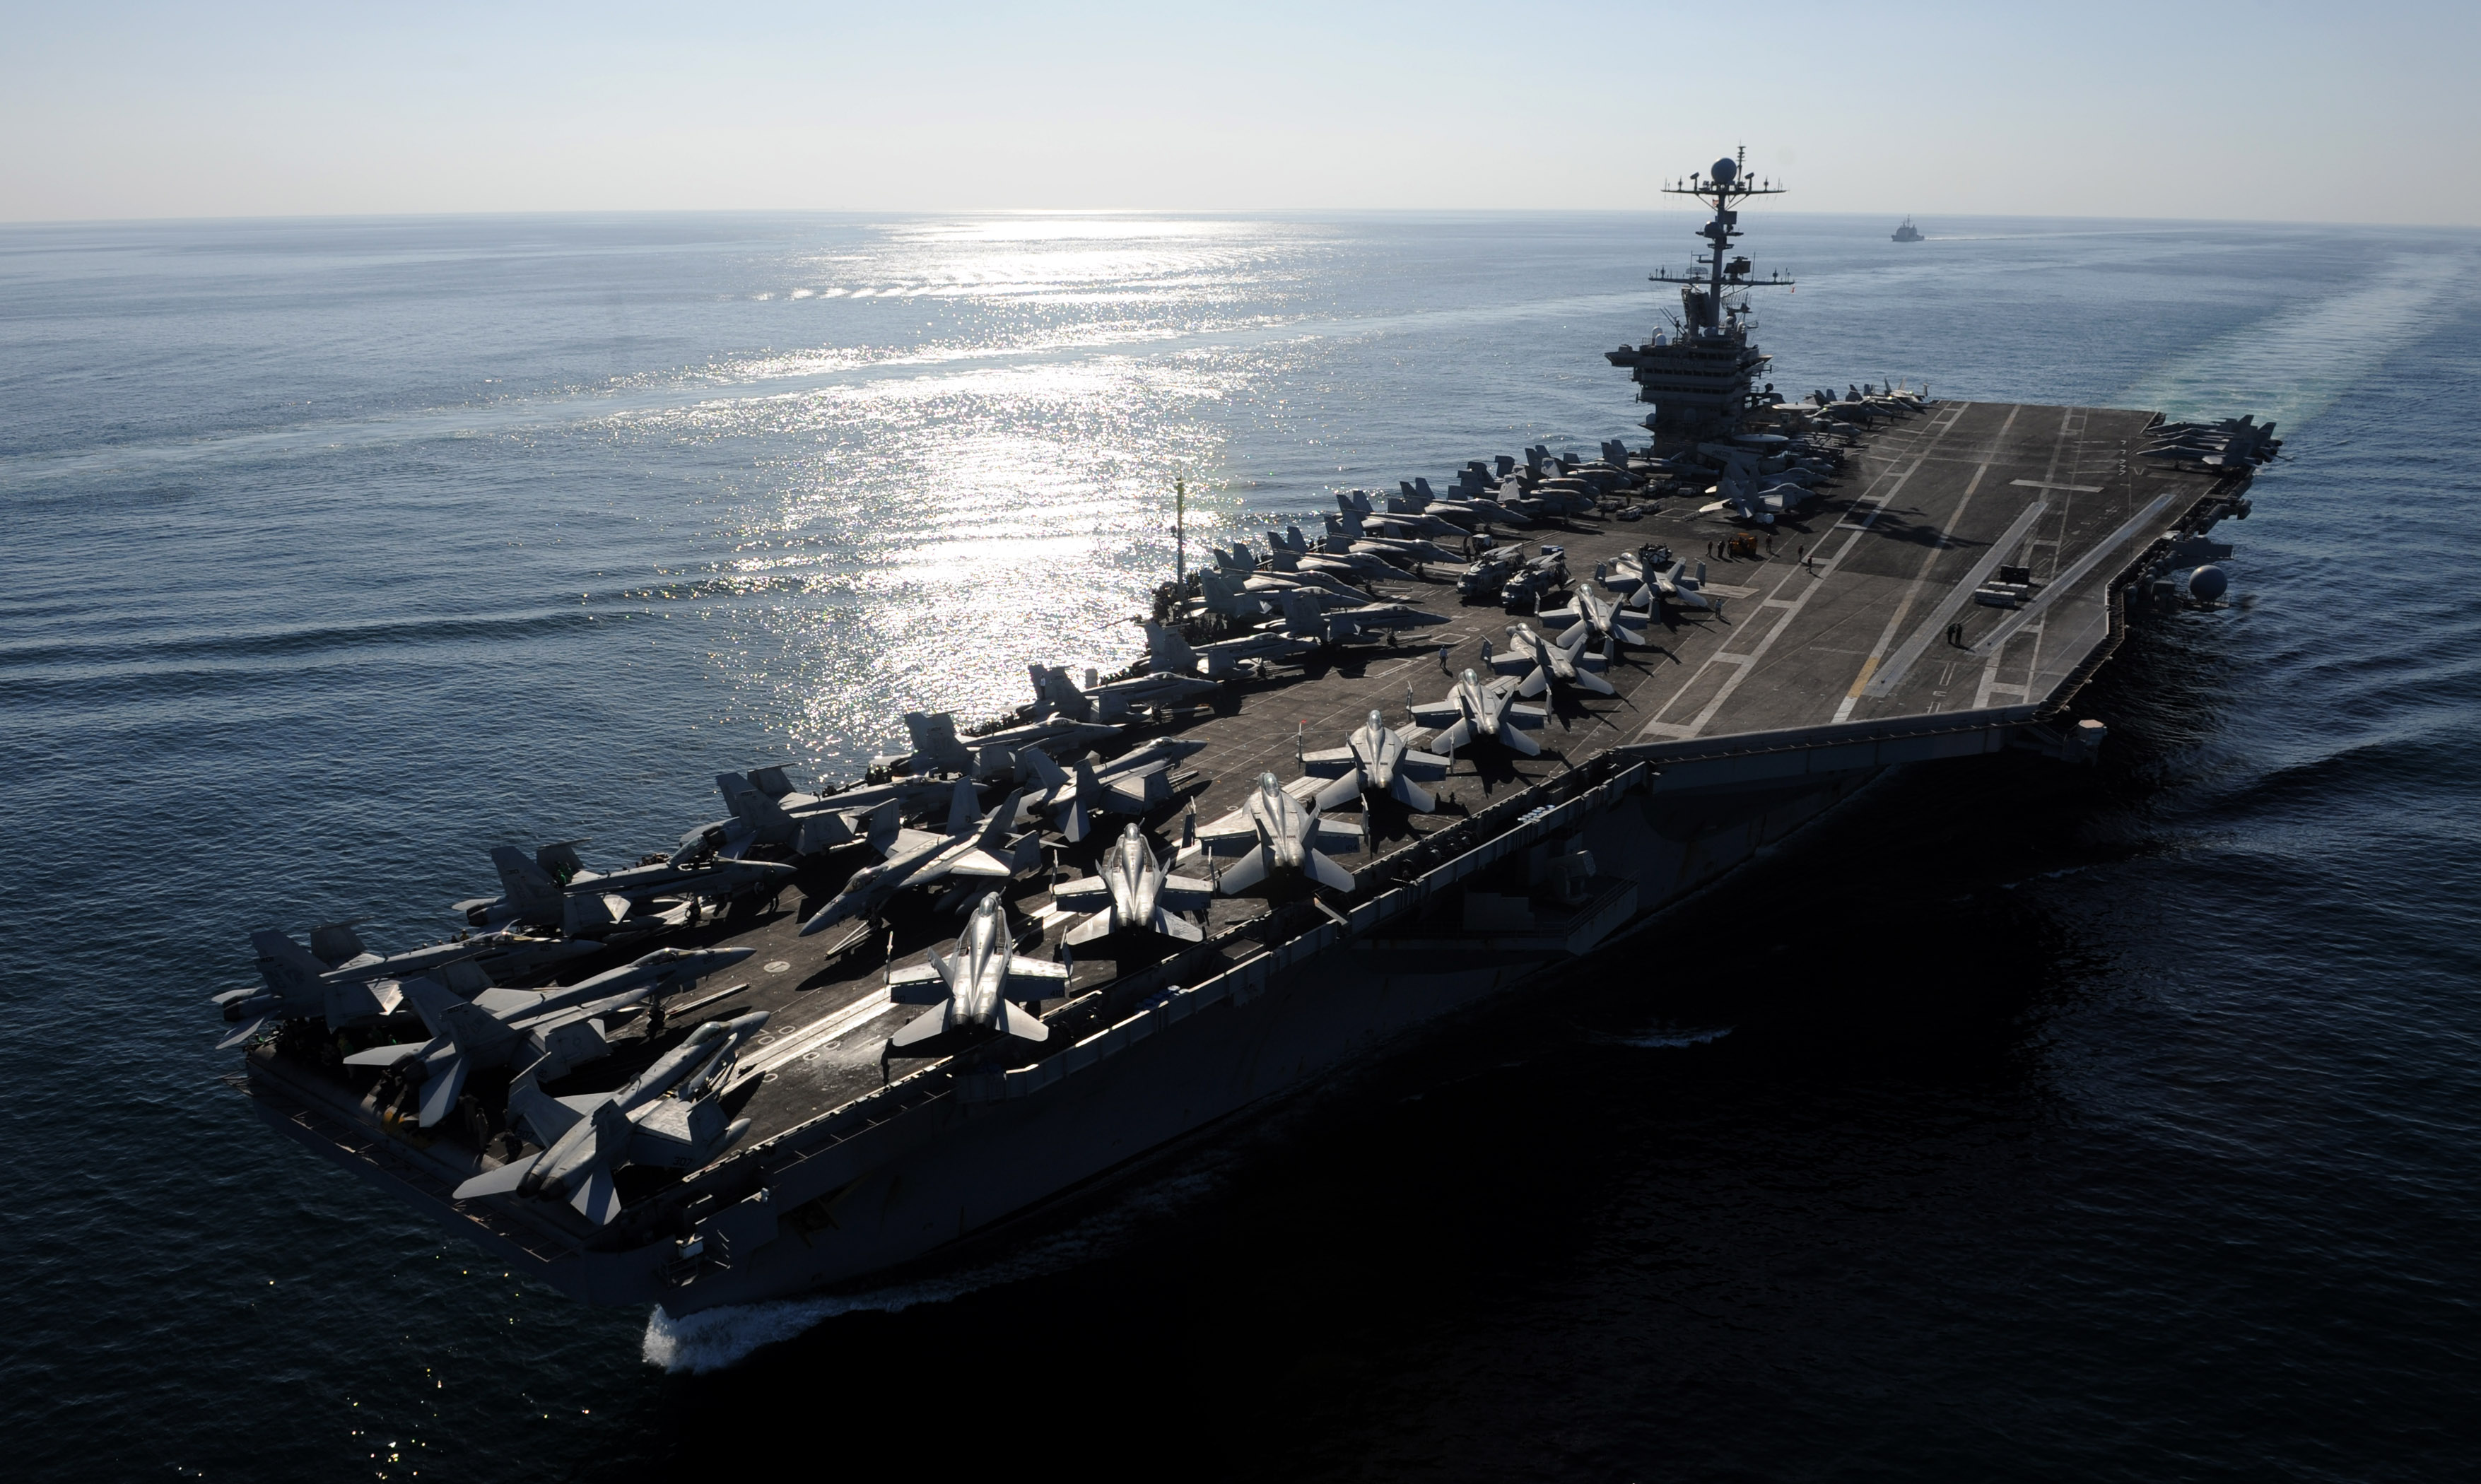 USS John C. Stennis (CVN-74) steams through the Straits of Hormuz in 2011. US Navy Photo